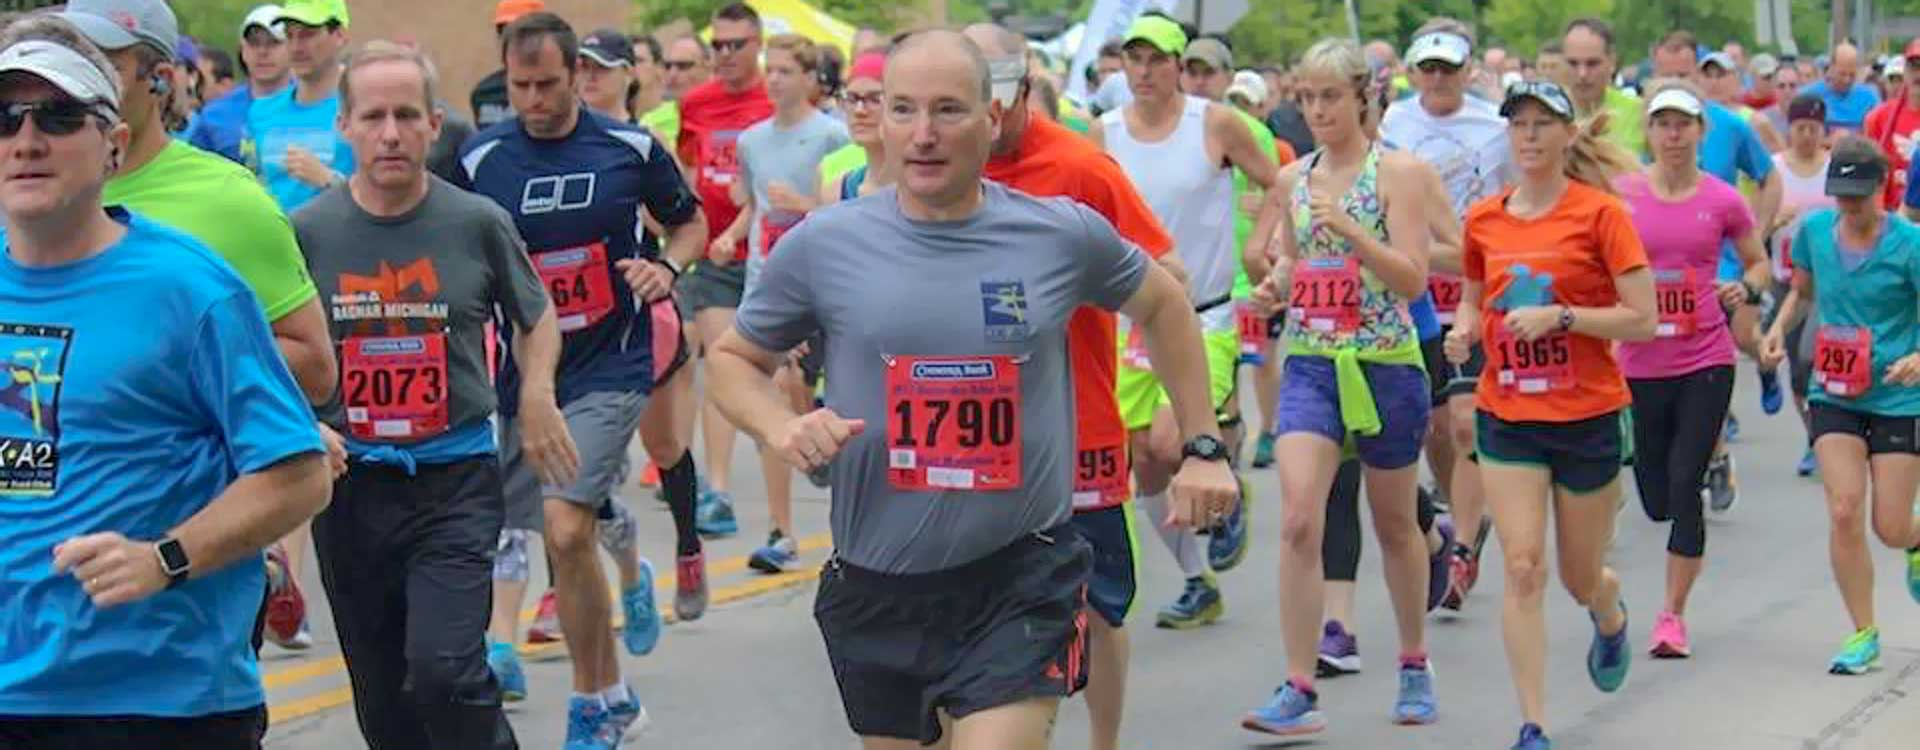 Dexter-Ann Arbor Run Results